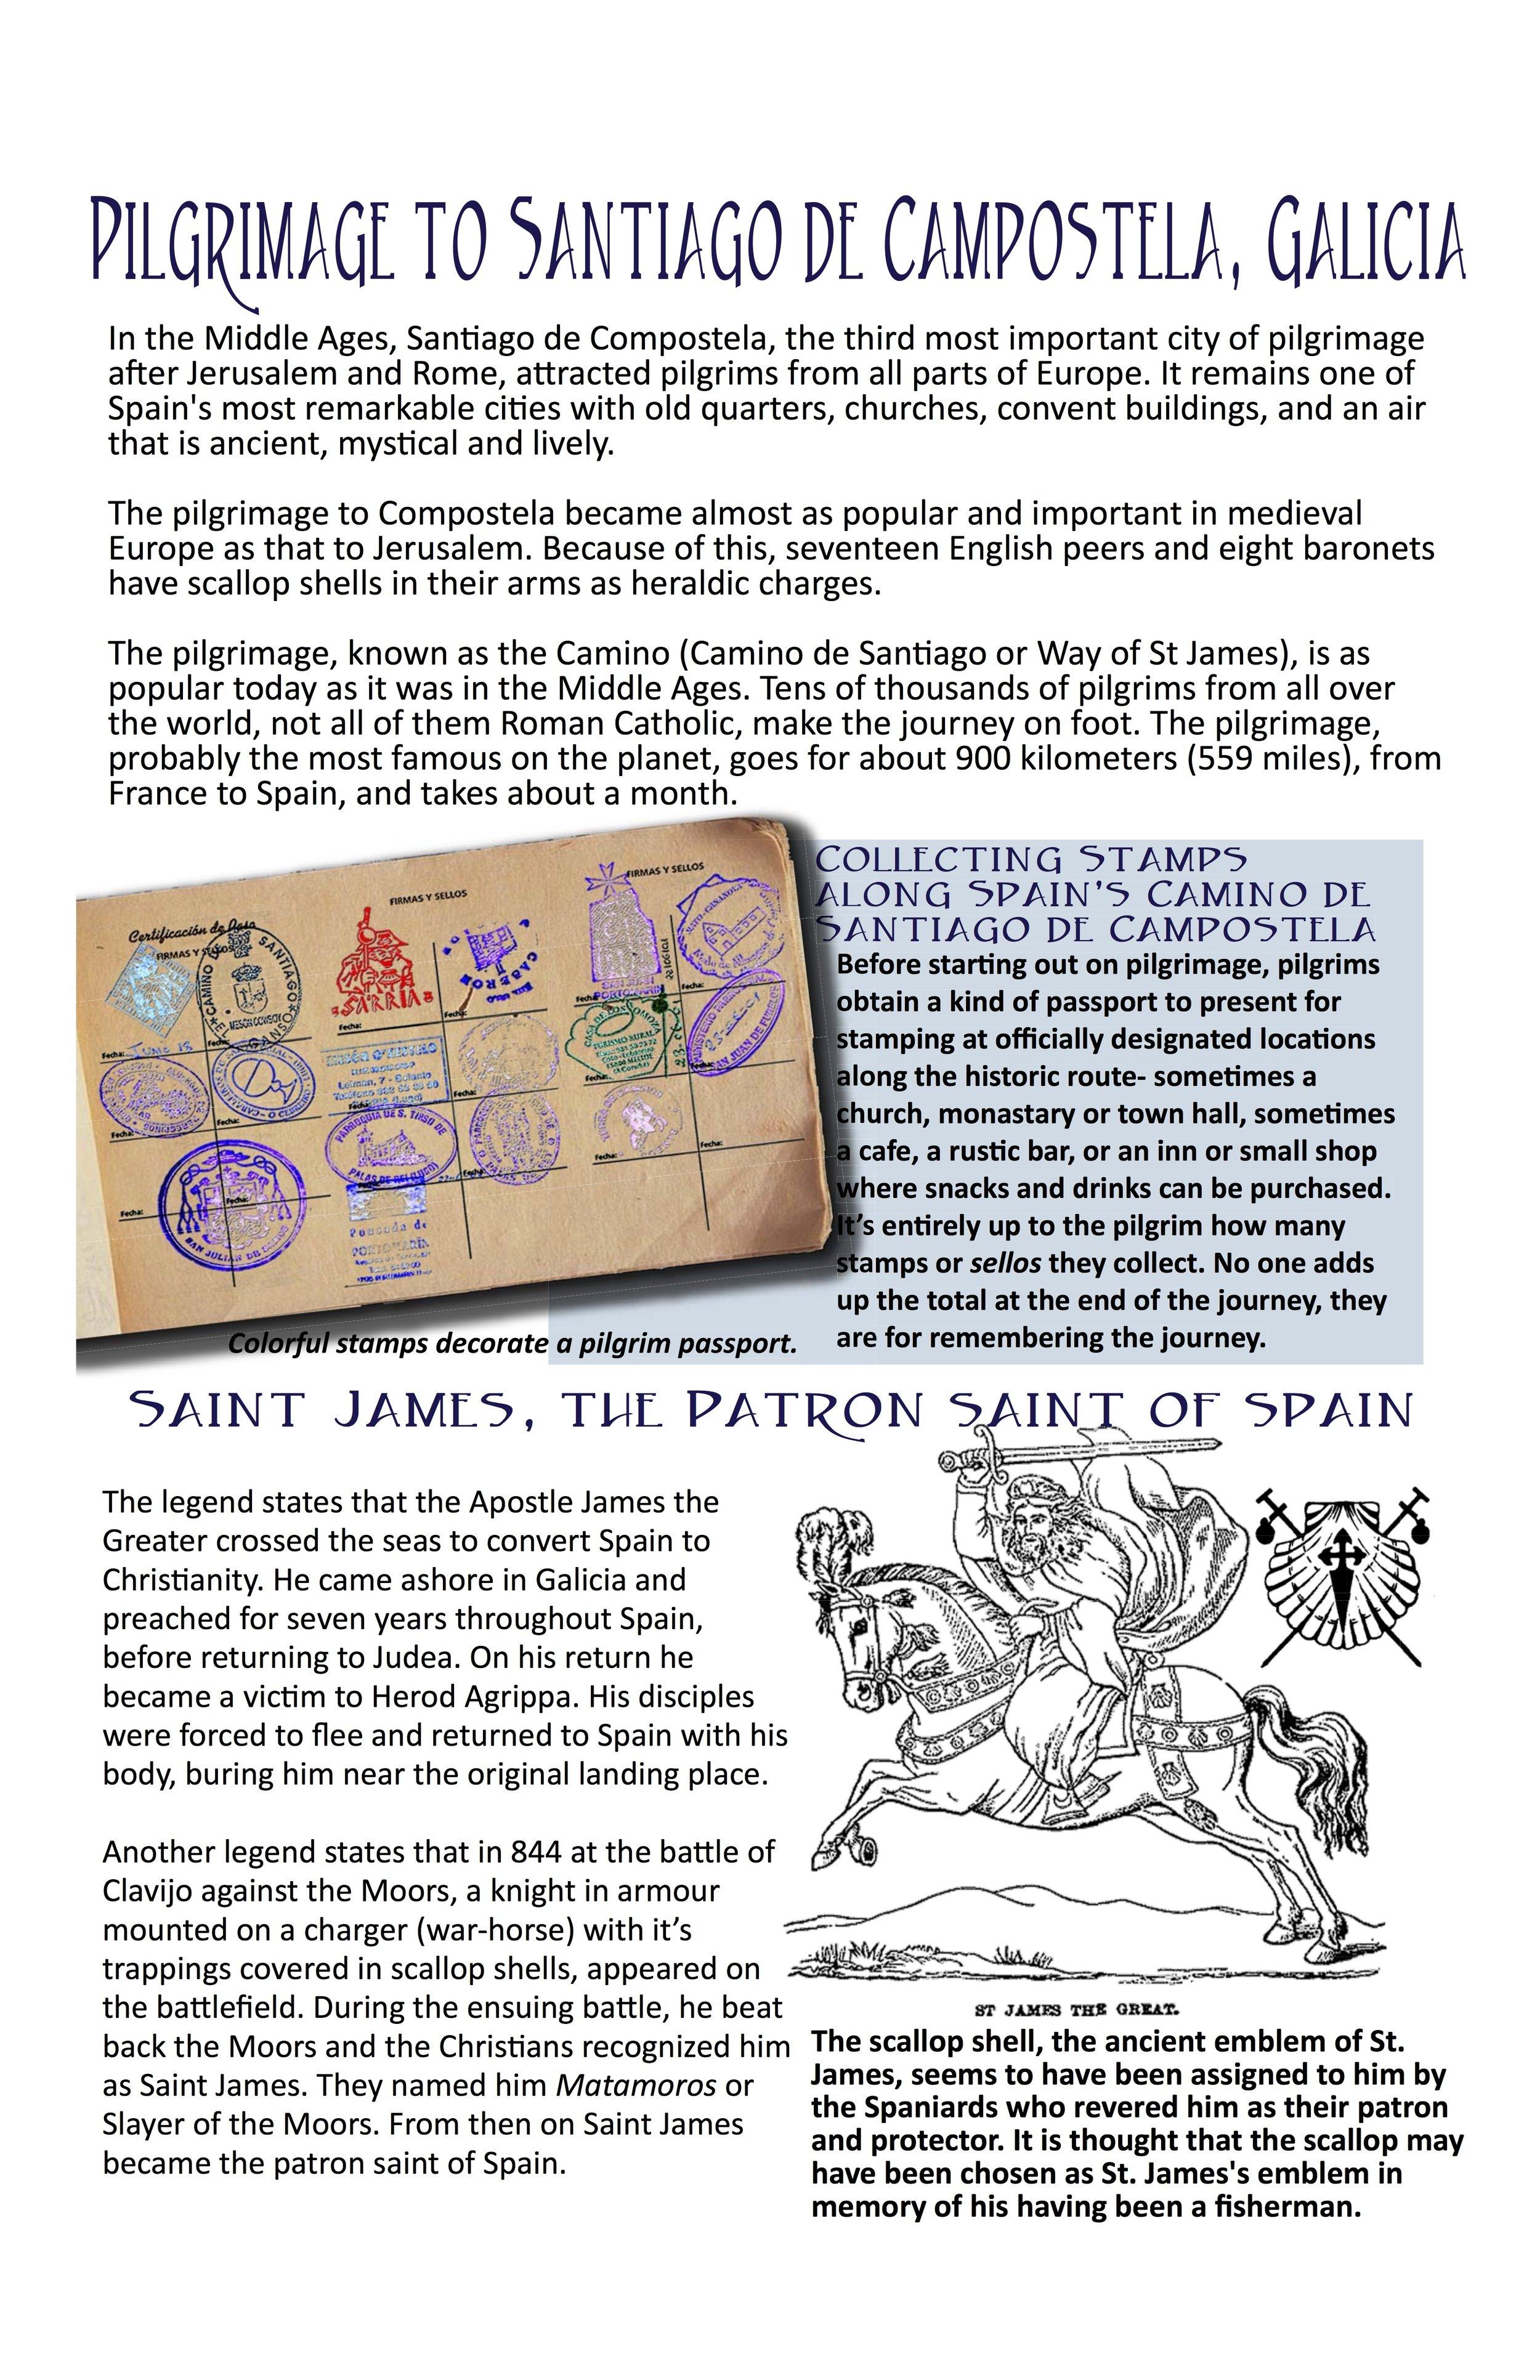 Galicia • Pilgrimage and Saint James